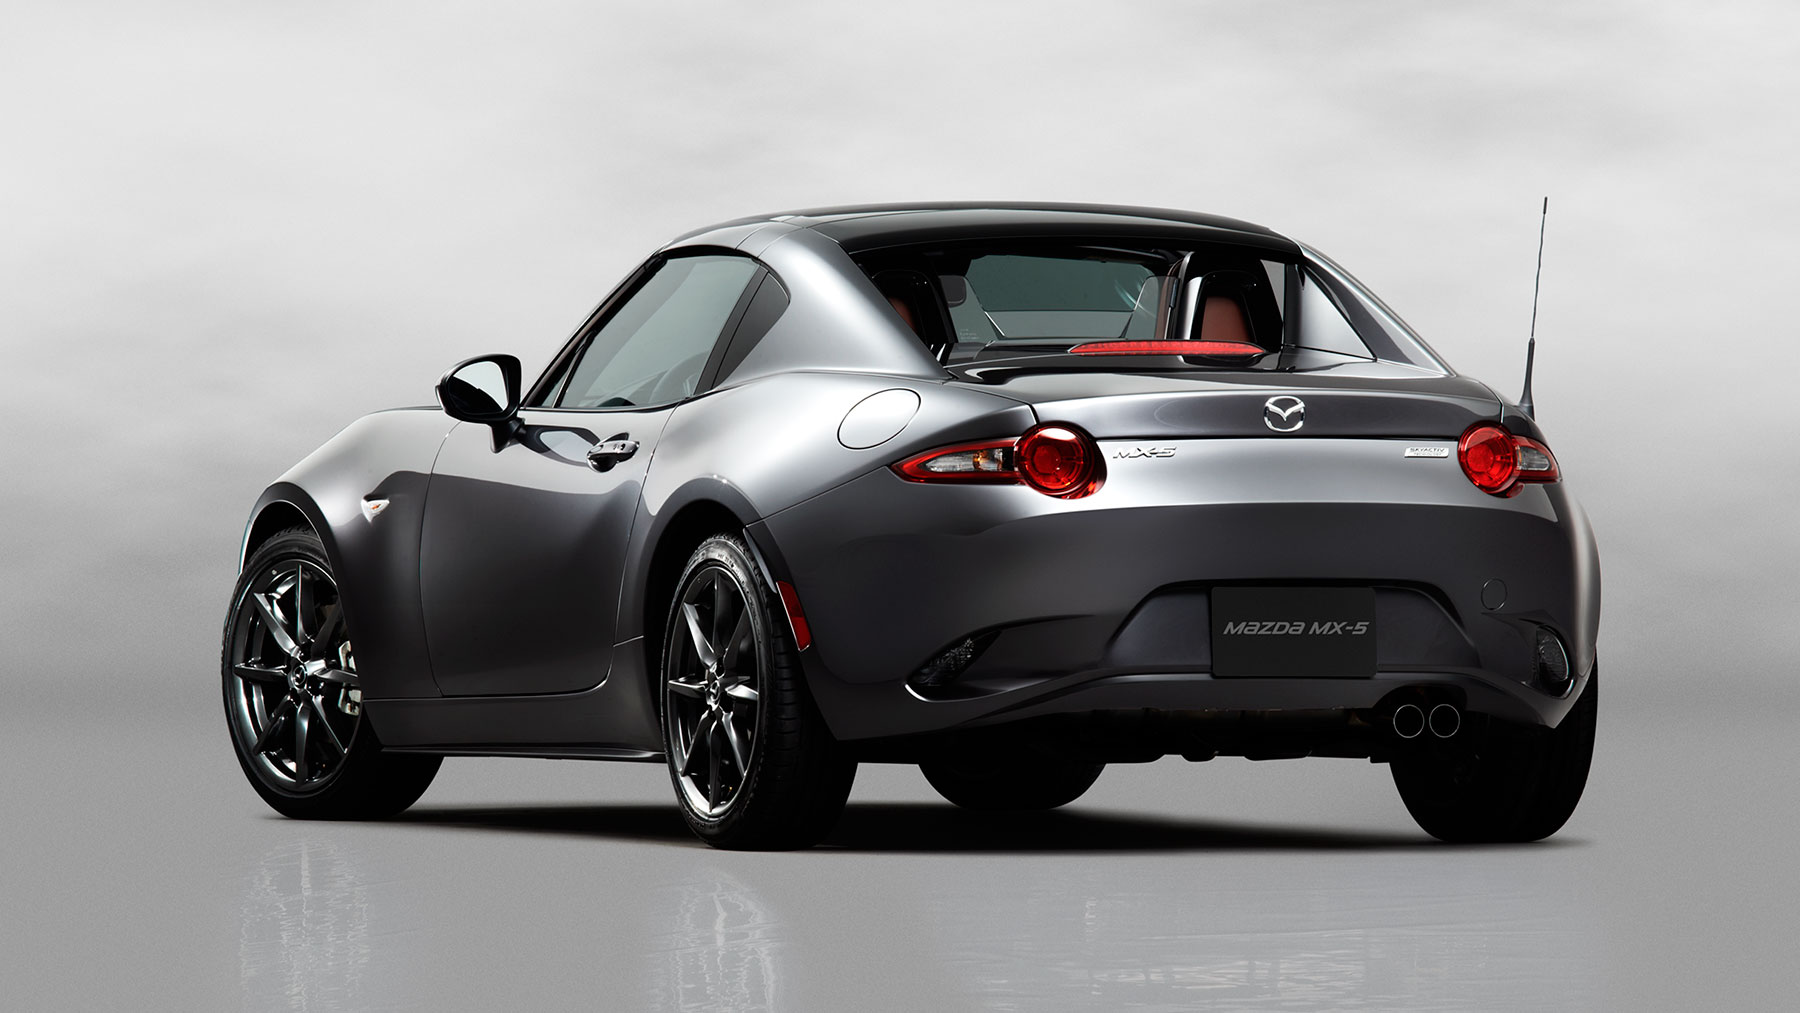 New Mazda MX-5 Miata Exterior image 1